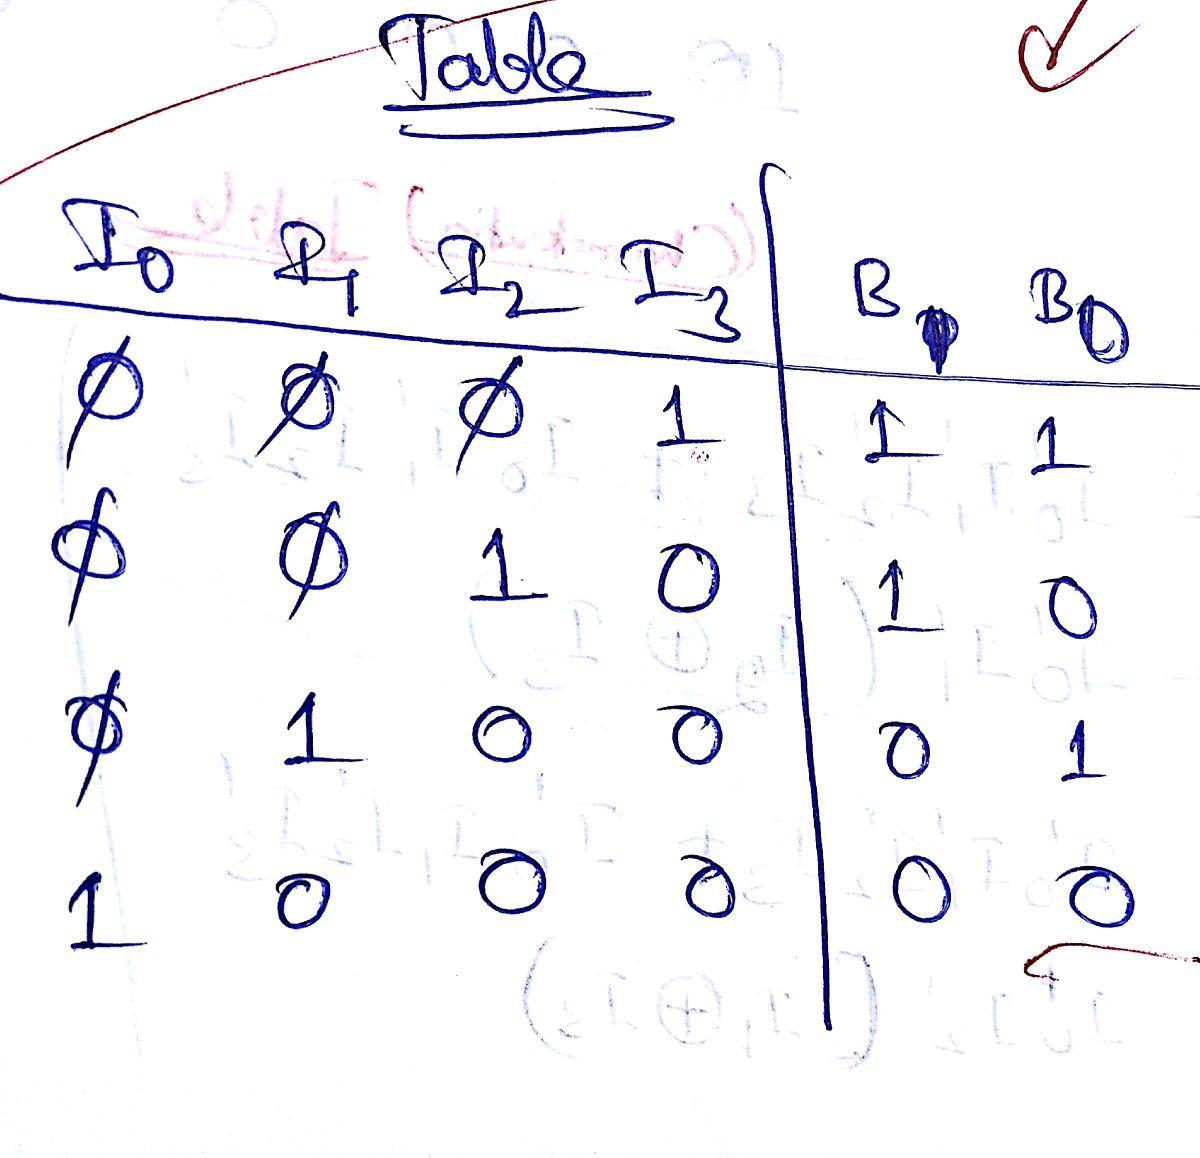 Priority Encoders Math Logic Priorities